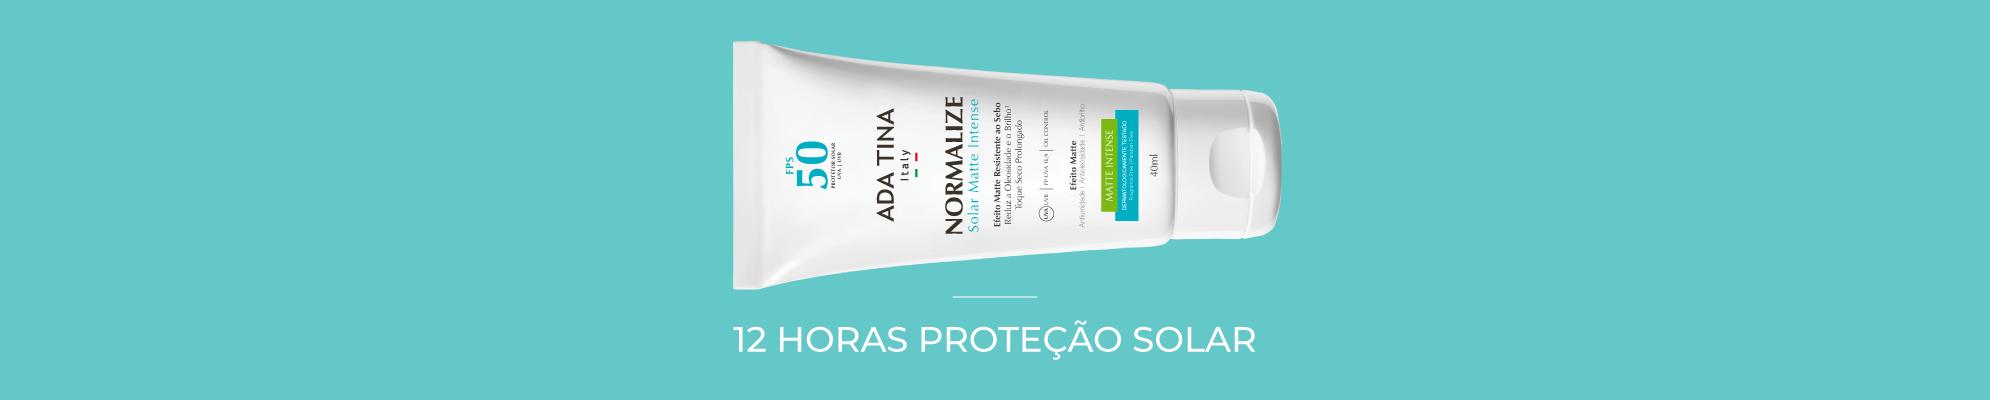 Banner Desktop - Proteção Solar / Normalize